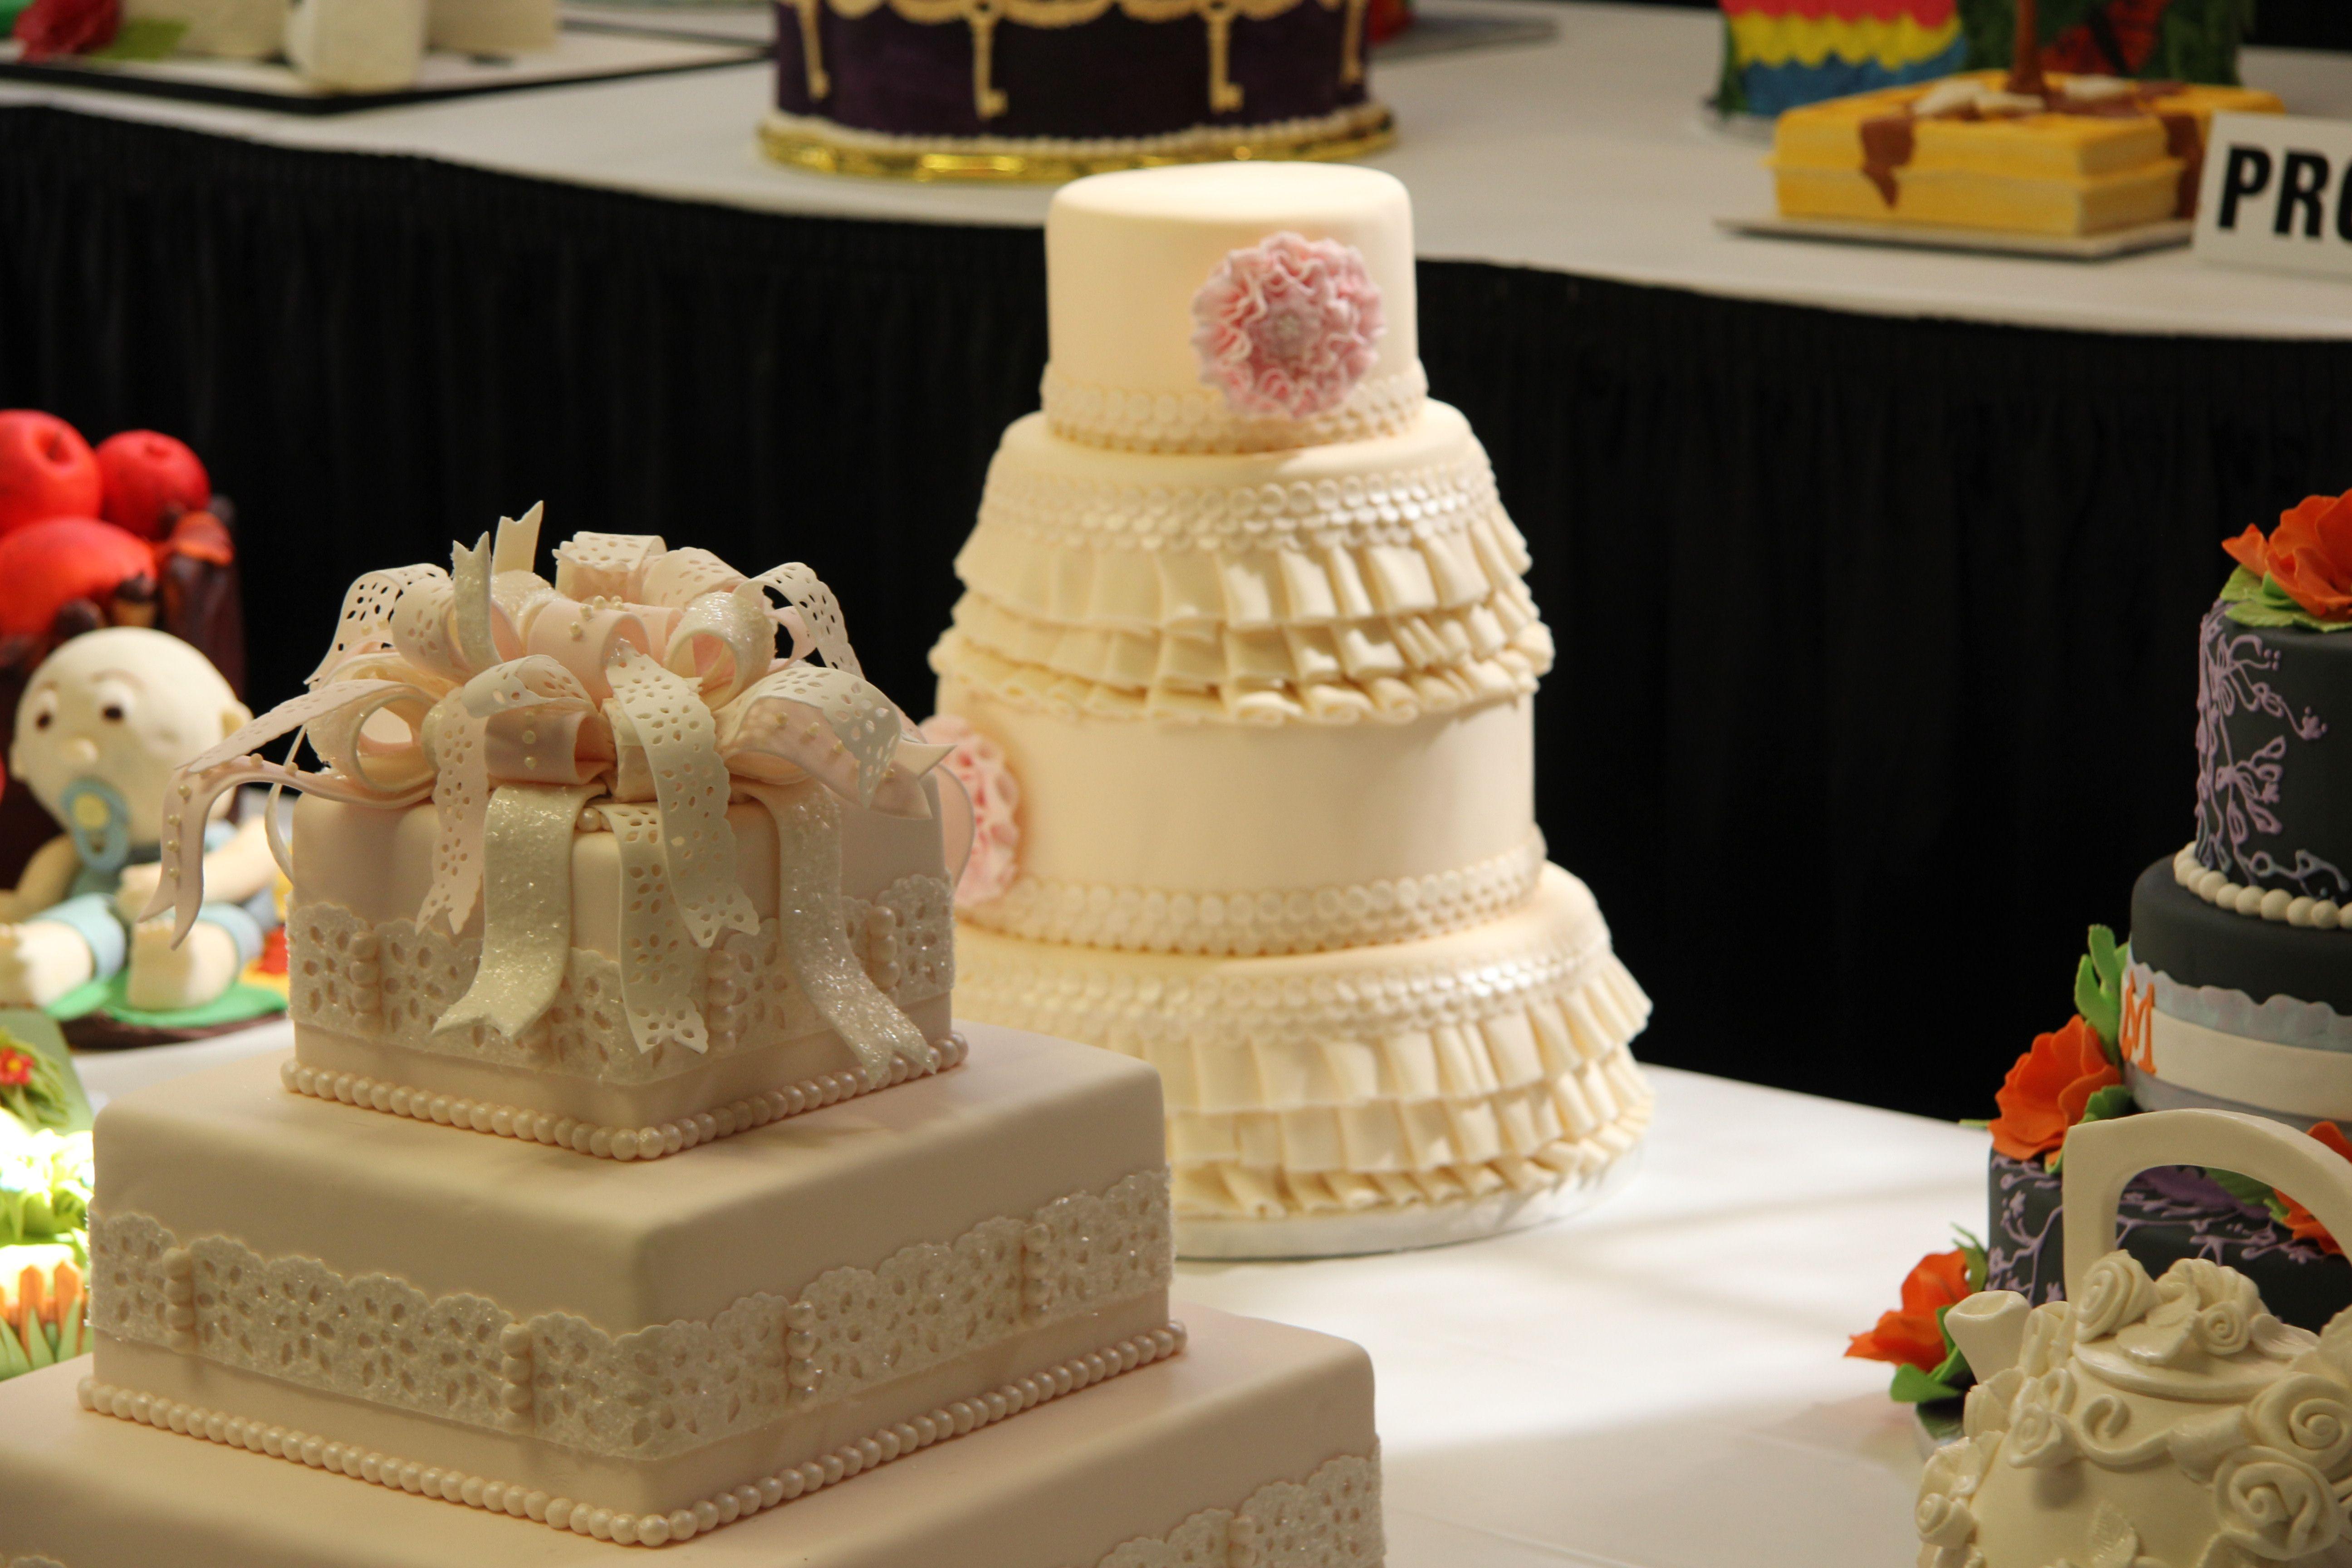 Imgg such beautiful cakes to create